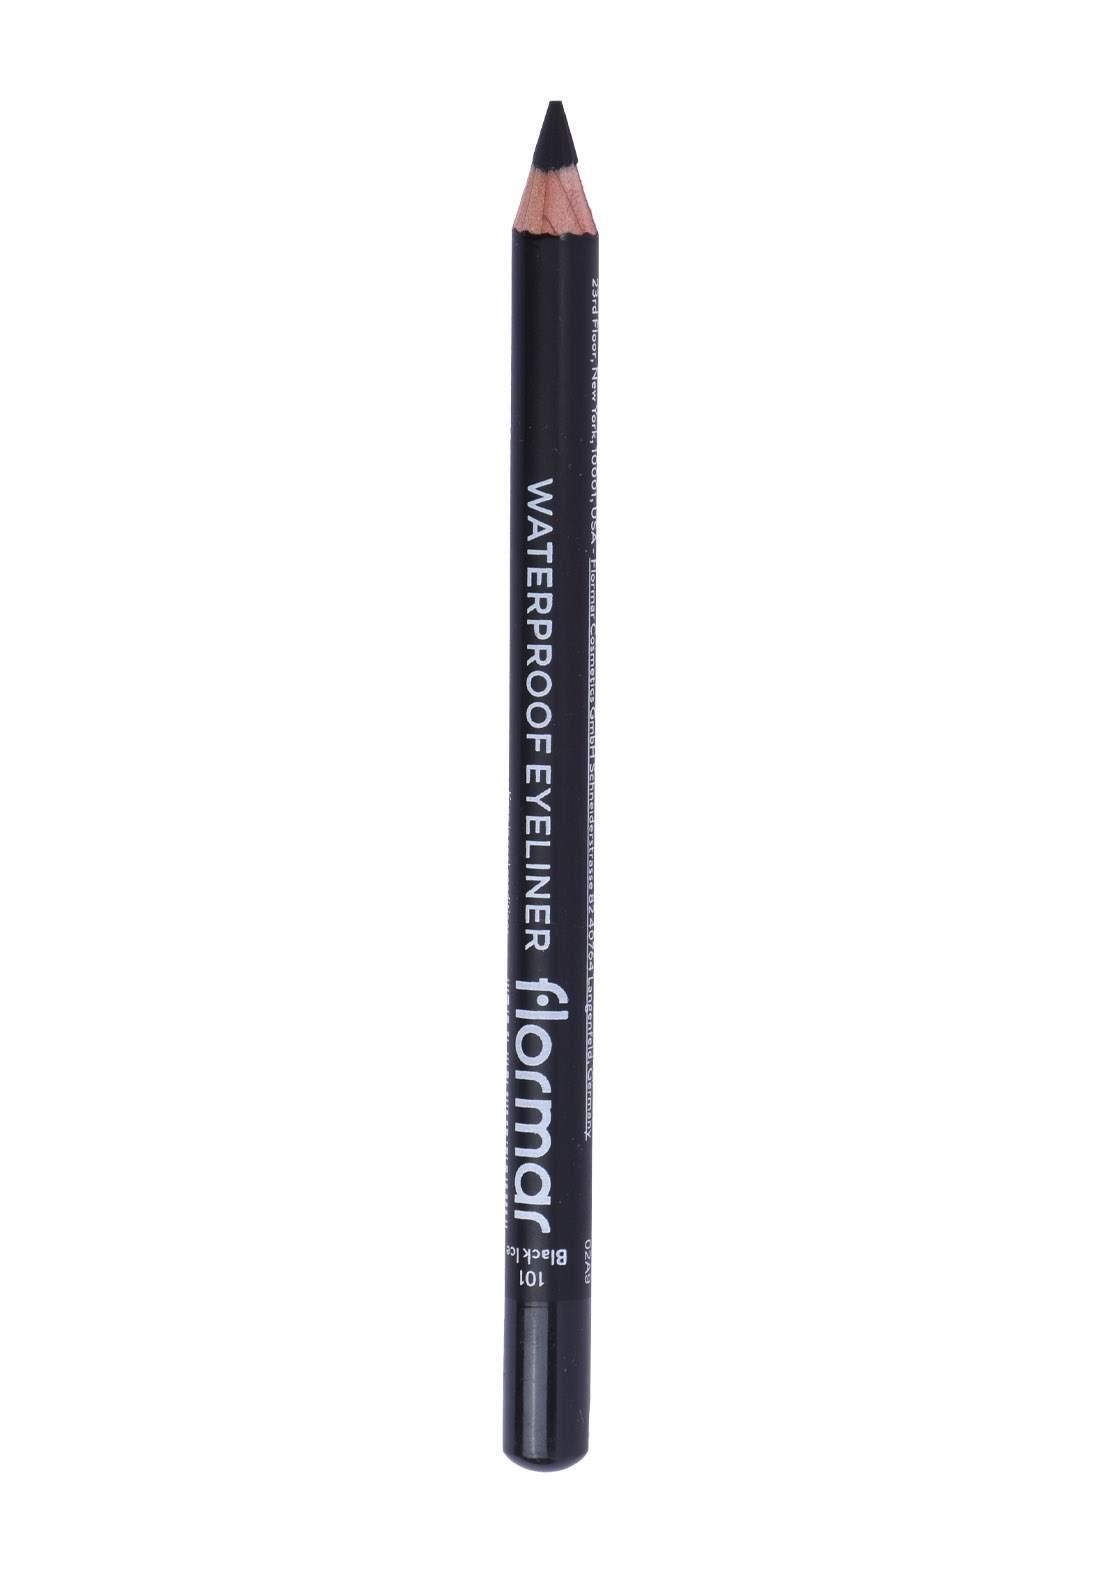 Flormar  Eyeliner - Waterproof Eyeliner NO. 101-Black قلم تحديد العين